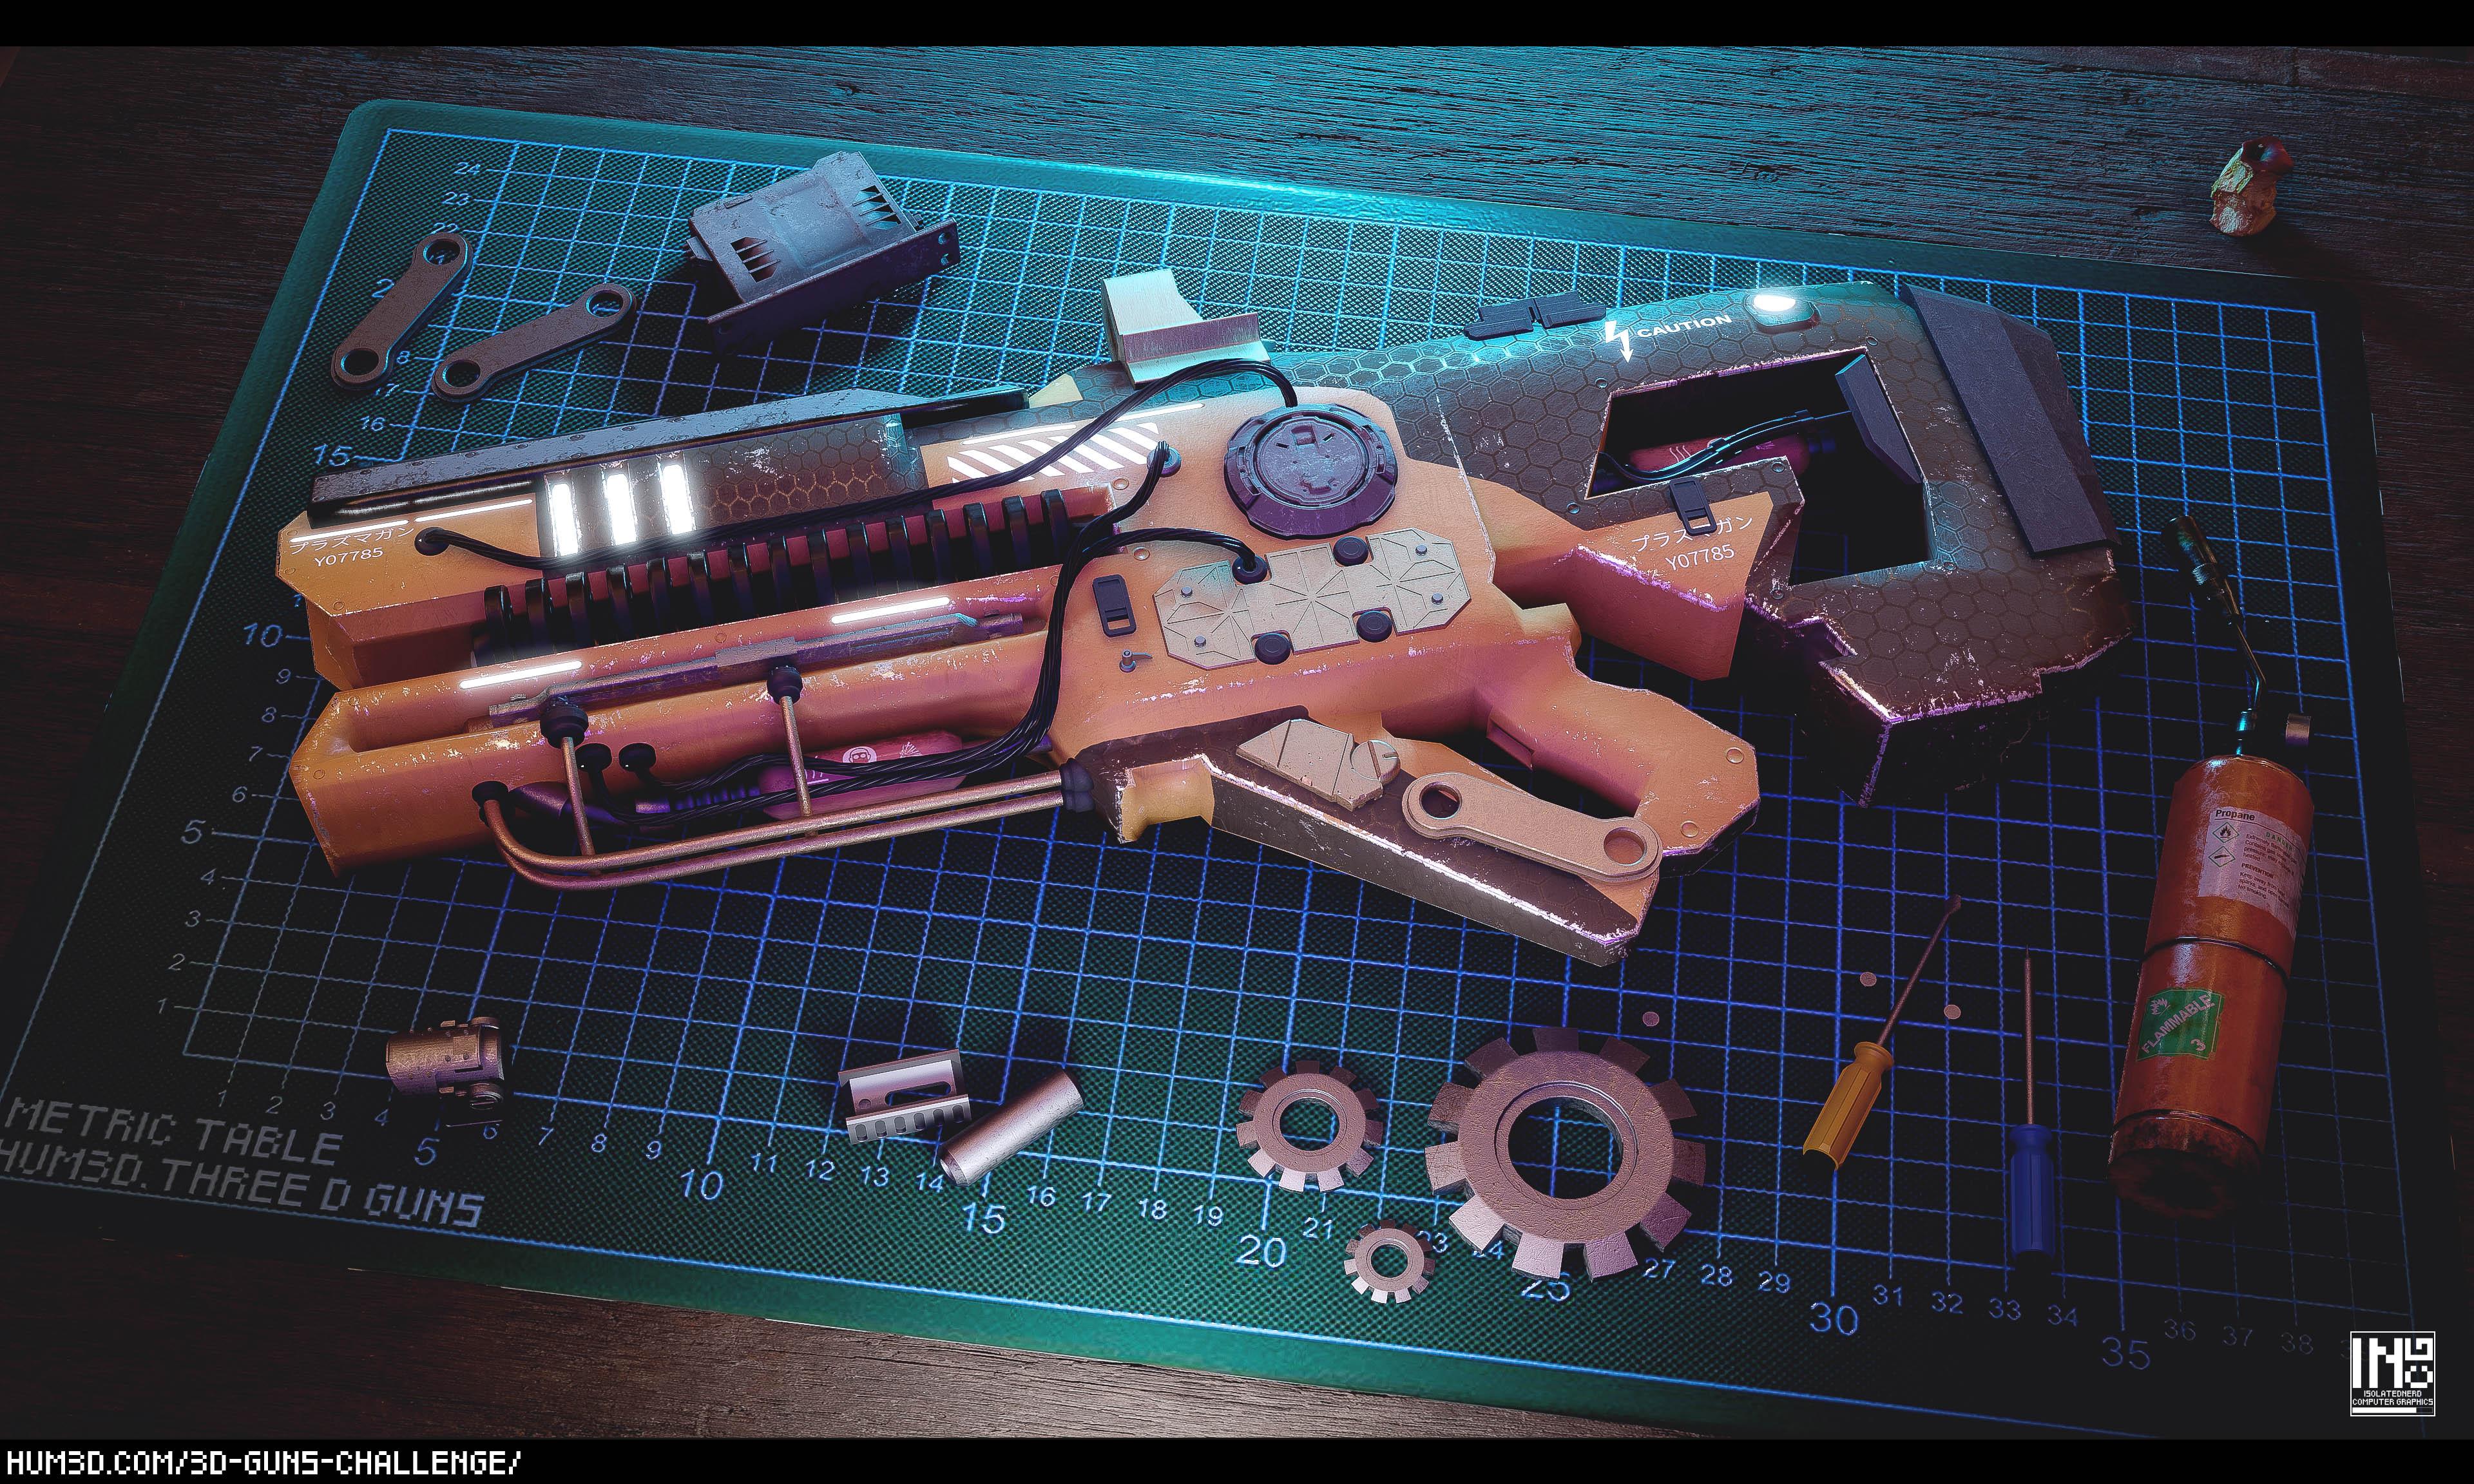 Work Bench - Customized Weapon 3d art